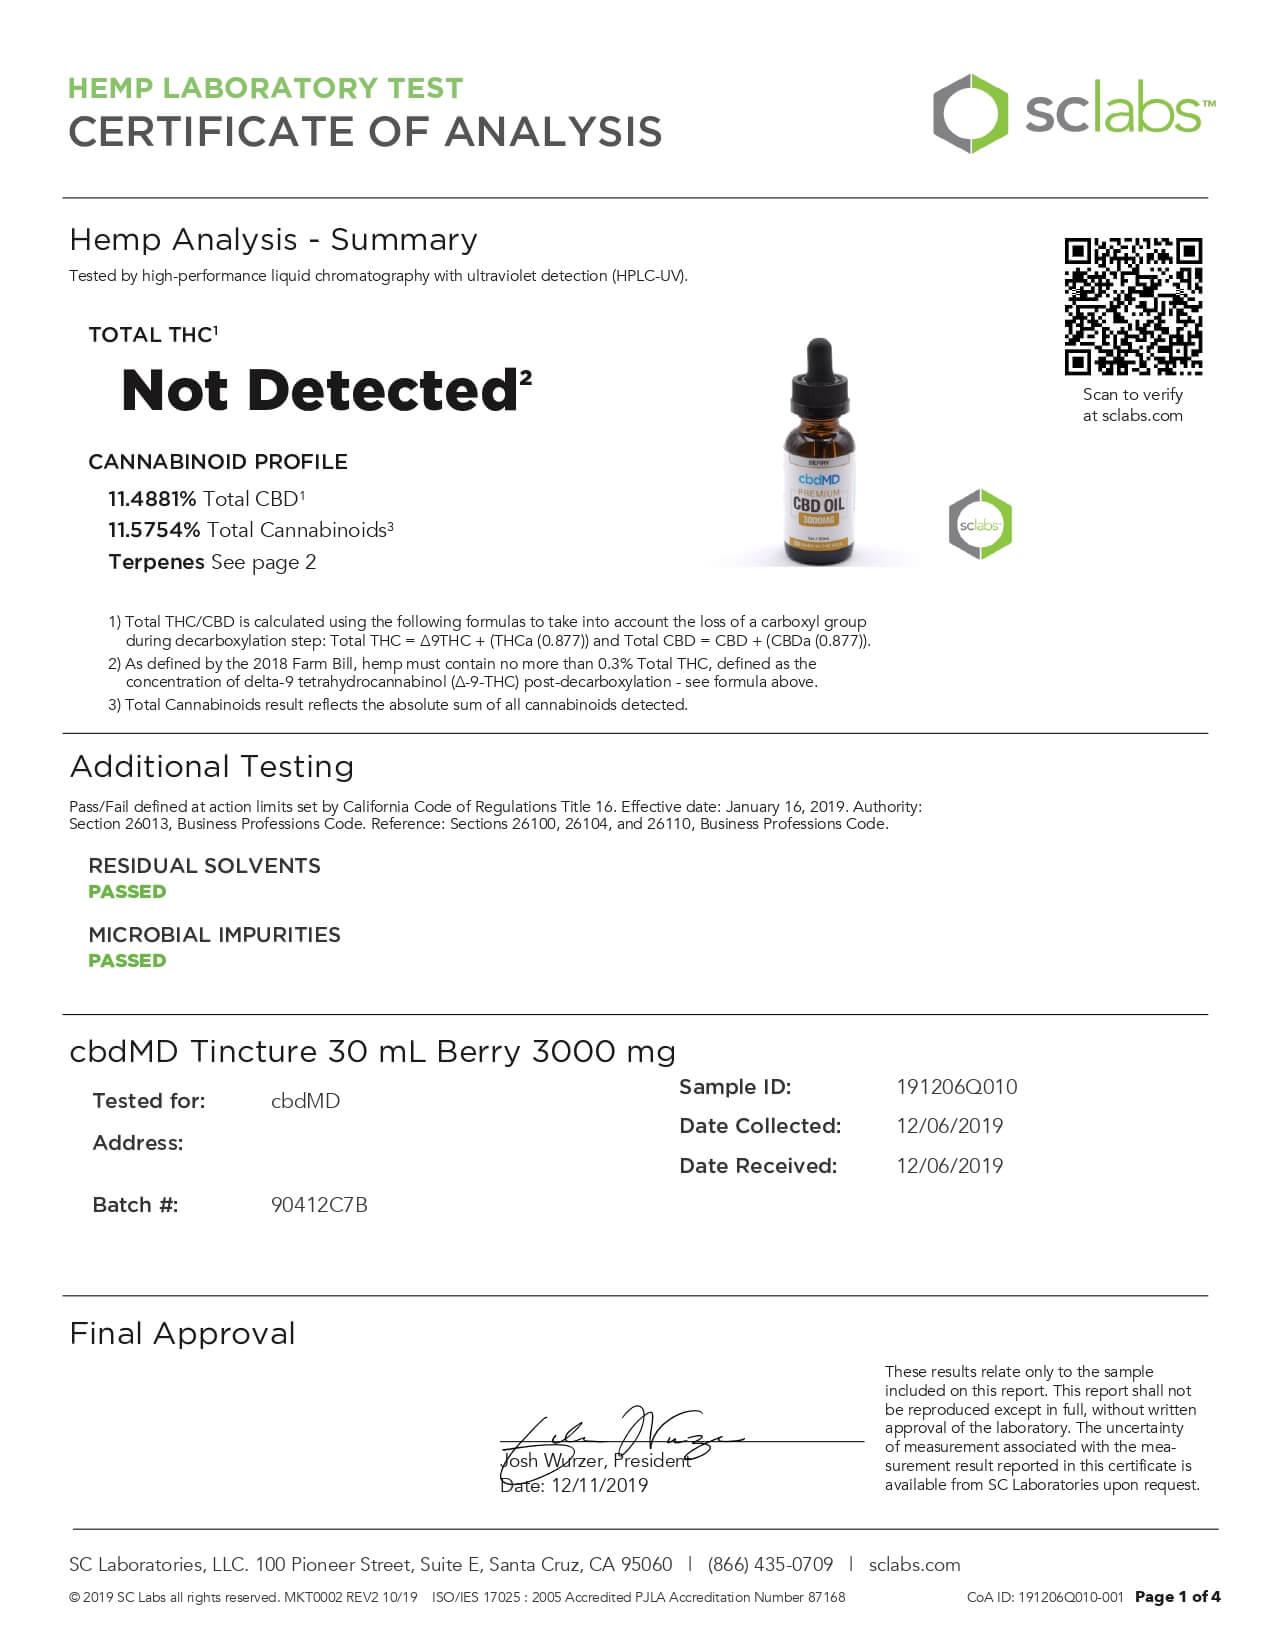 cbdMD CBD Tincture Broad Spectrum Berry 30ml 3000mg Lab Report